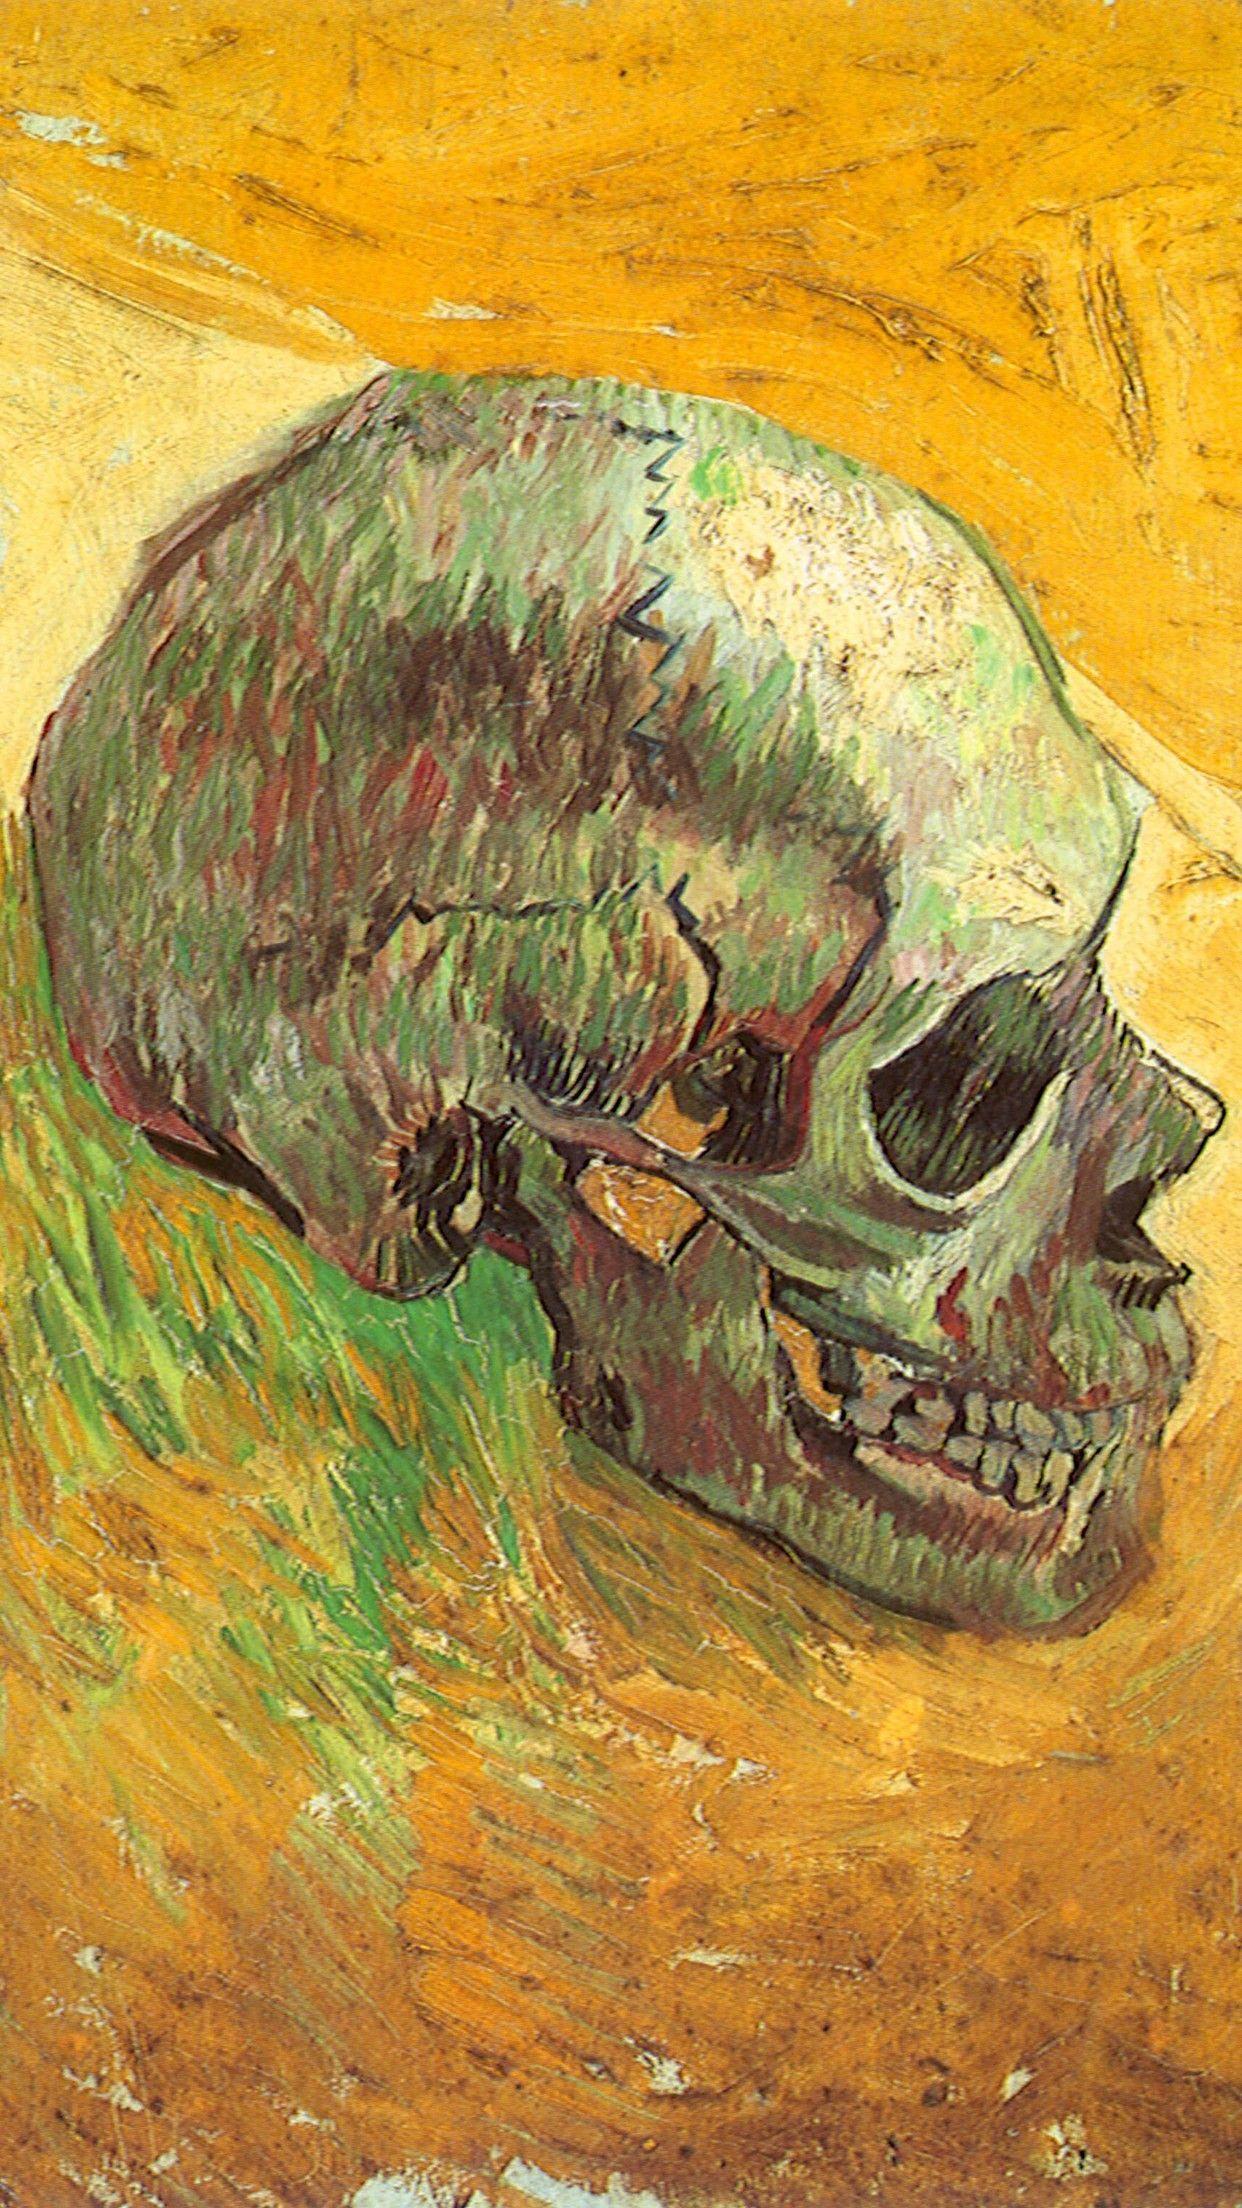 752x1334 Van Goghs Painting In IPhone